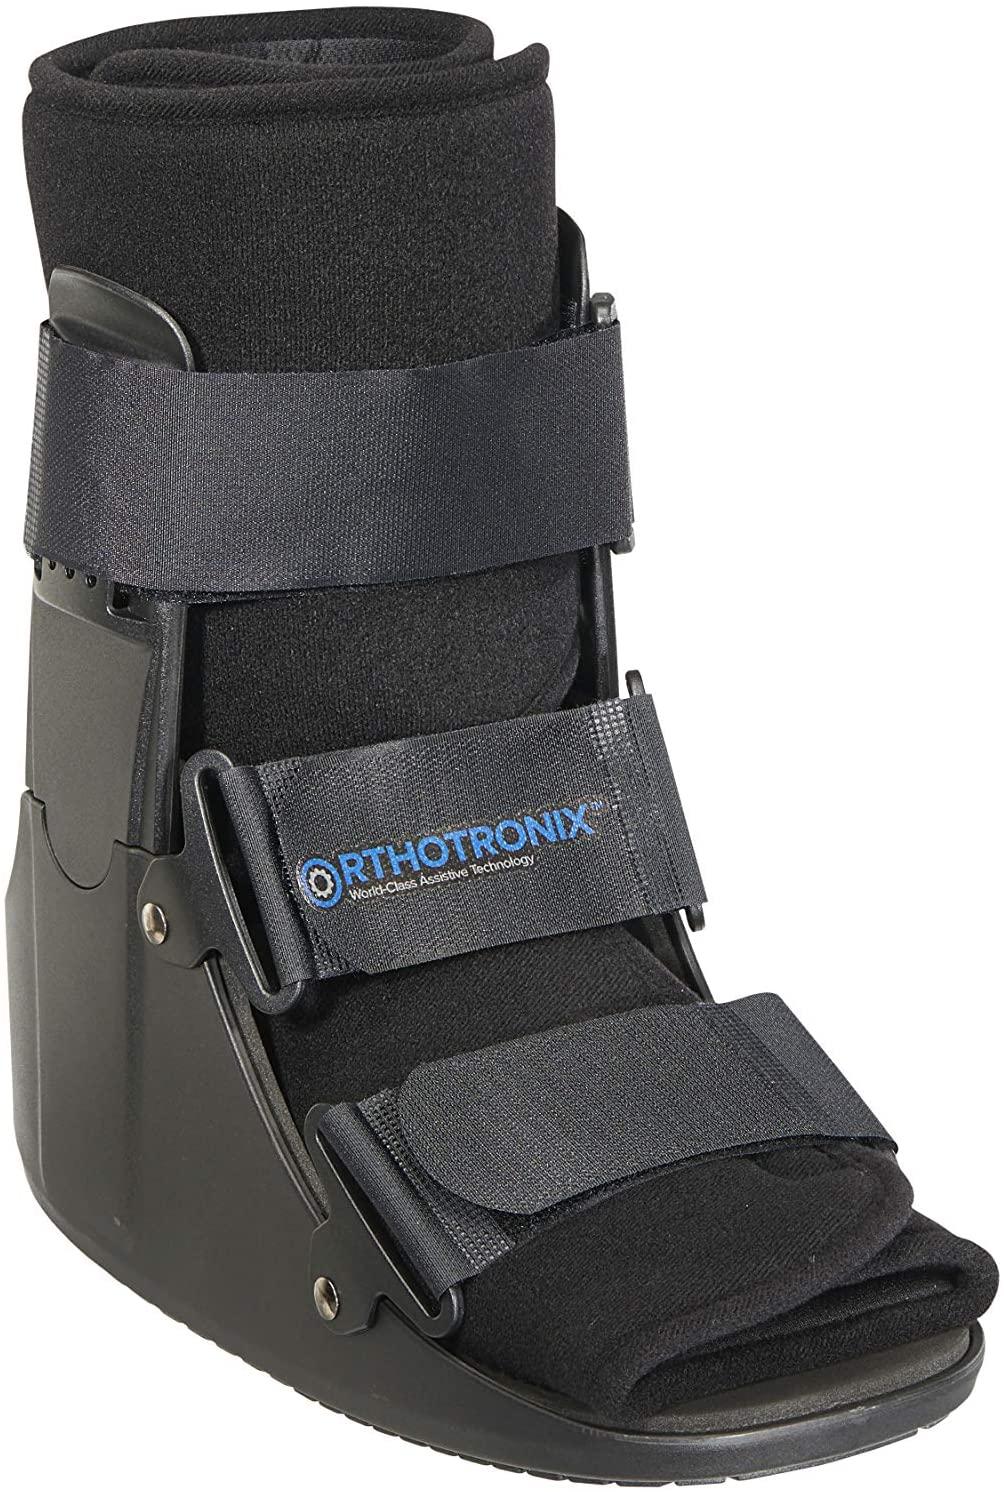 Orthotronix Short Cam Walker Boot (Medium)